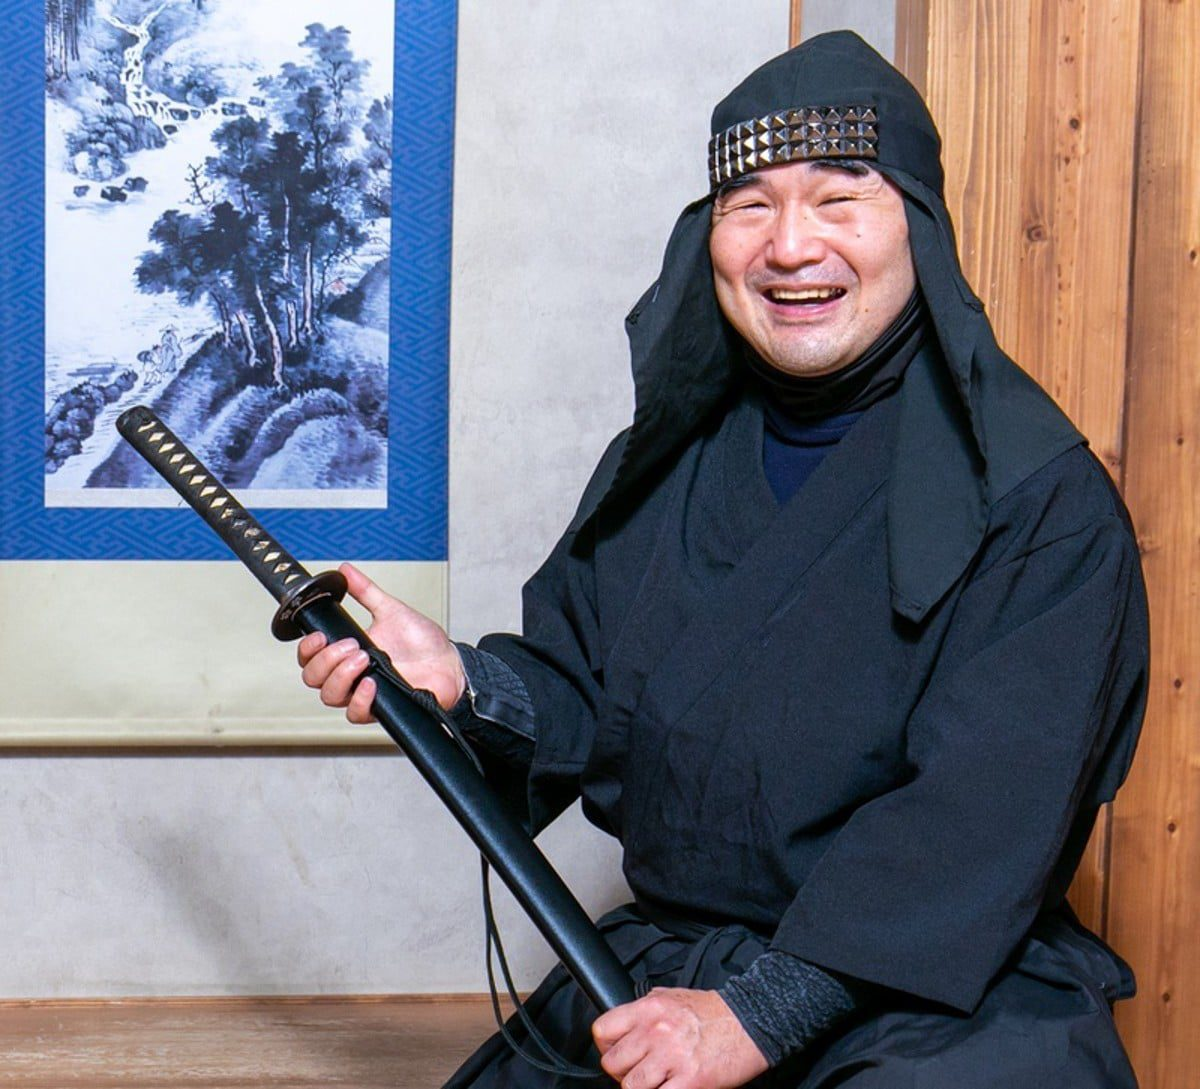 Ninja purpurpurpur